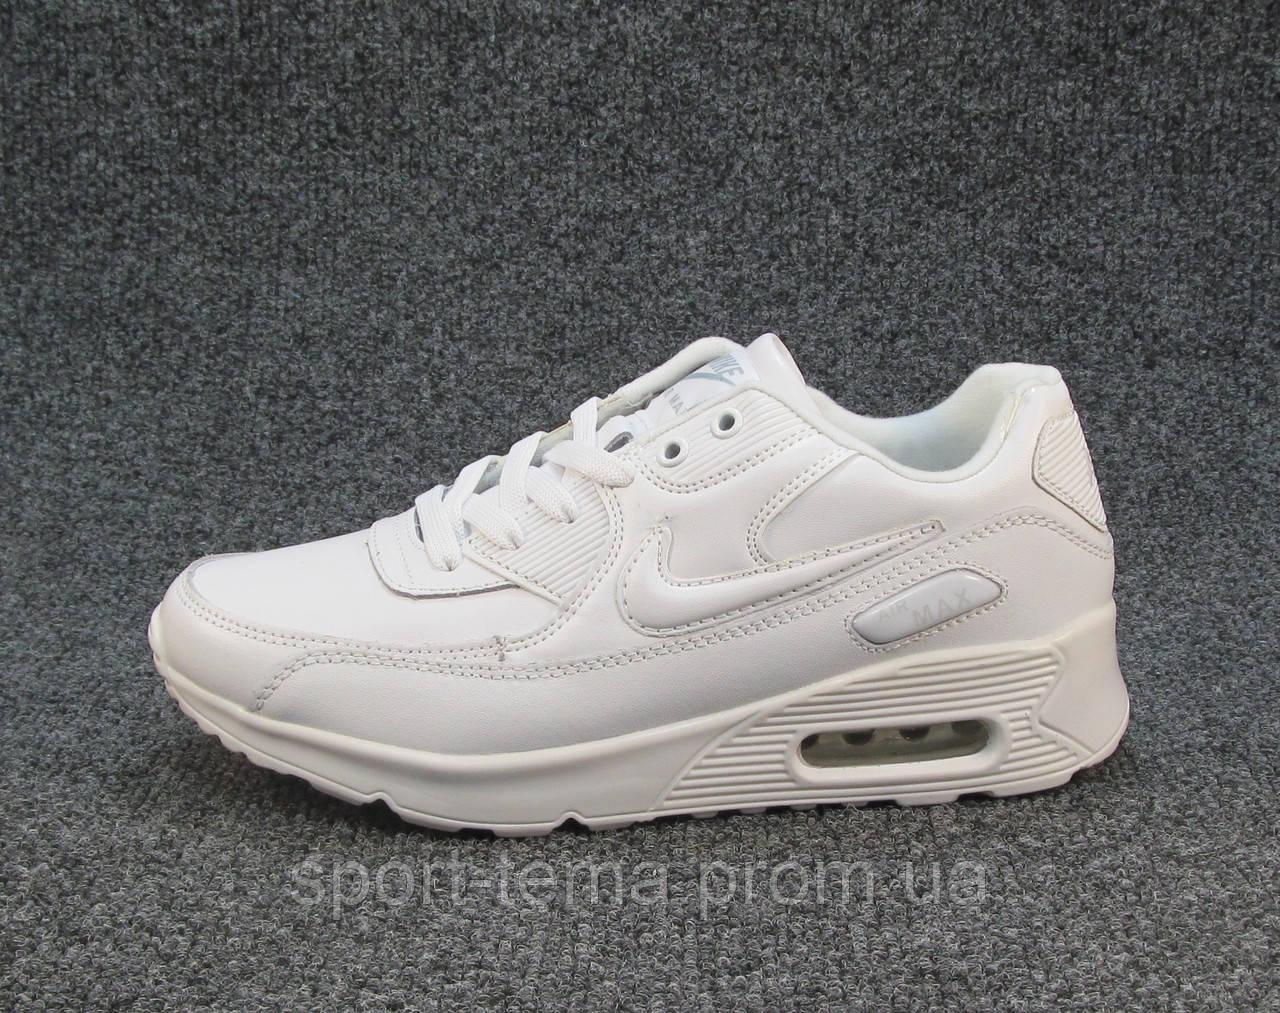 a03dc491 Кроссовки женские Nike Air Max белые (р.36,37,38,39,40): продажа ...